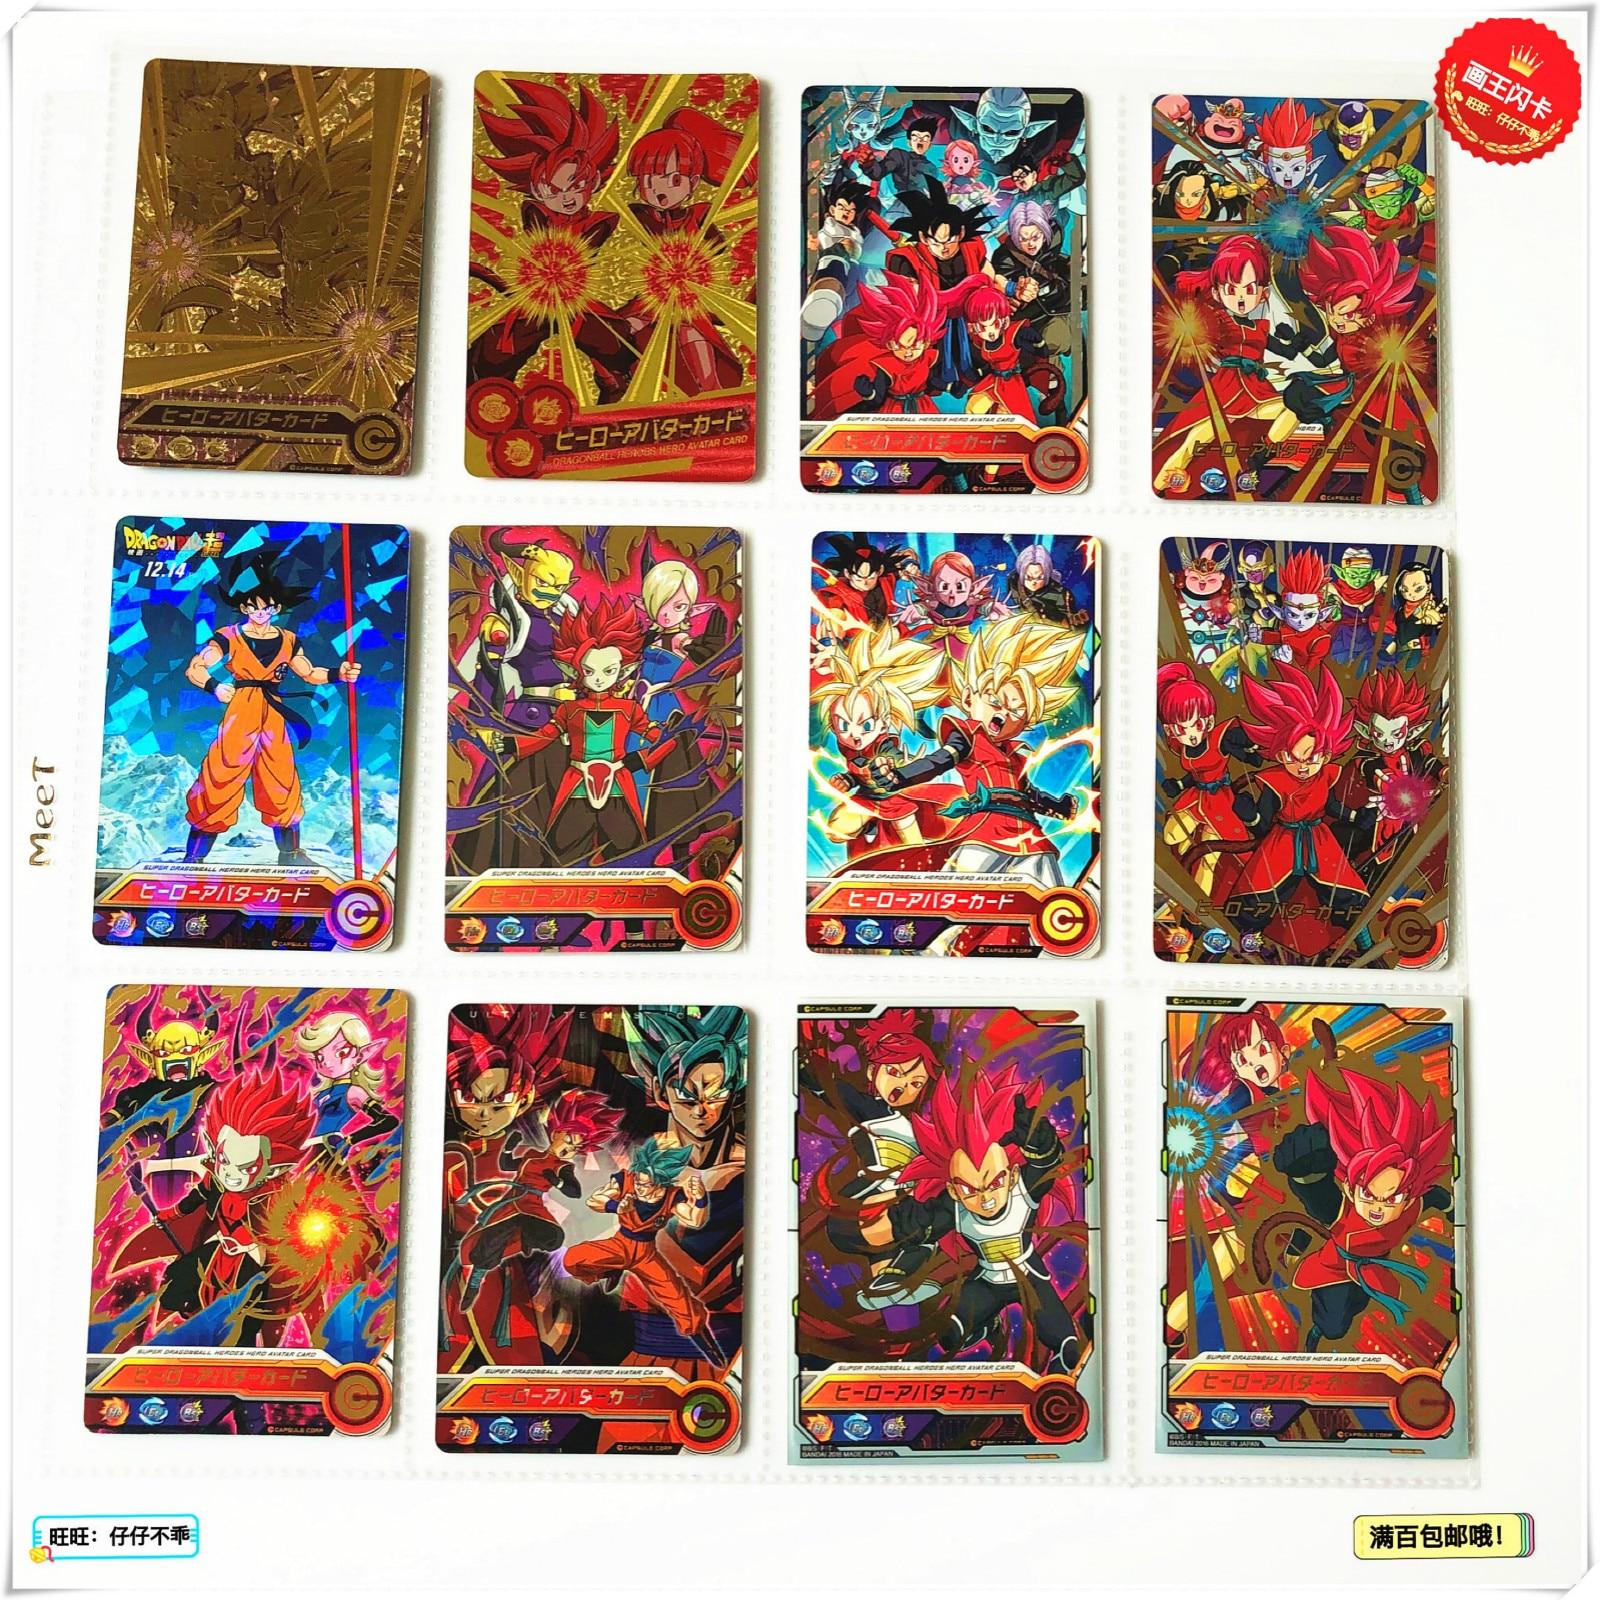 Japan Original Dragon Ball Hero Limited God God Super Saiyan Goku Toys Hobbies Collectibles Game Collection Anime Cards